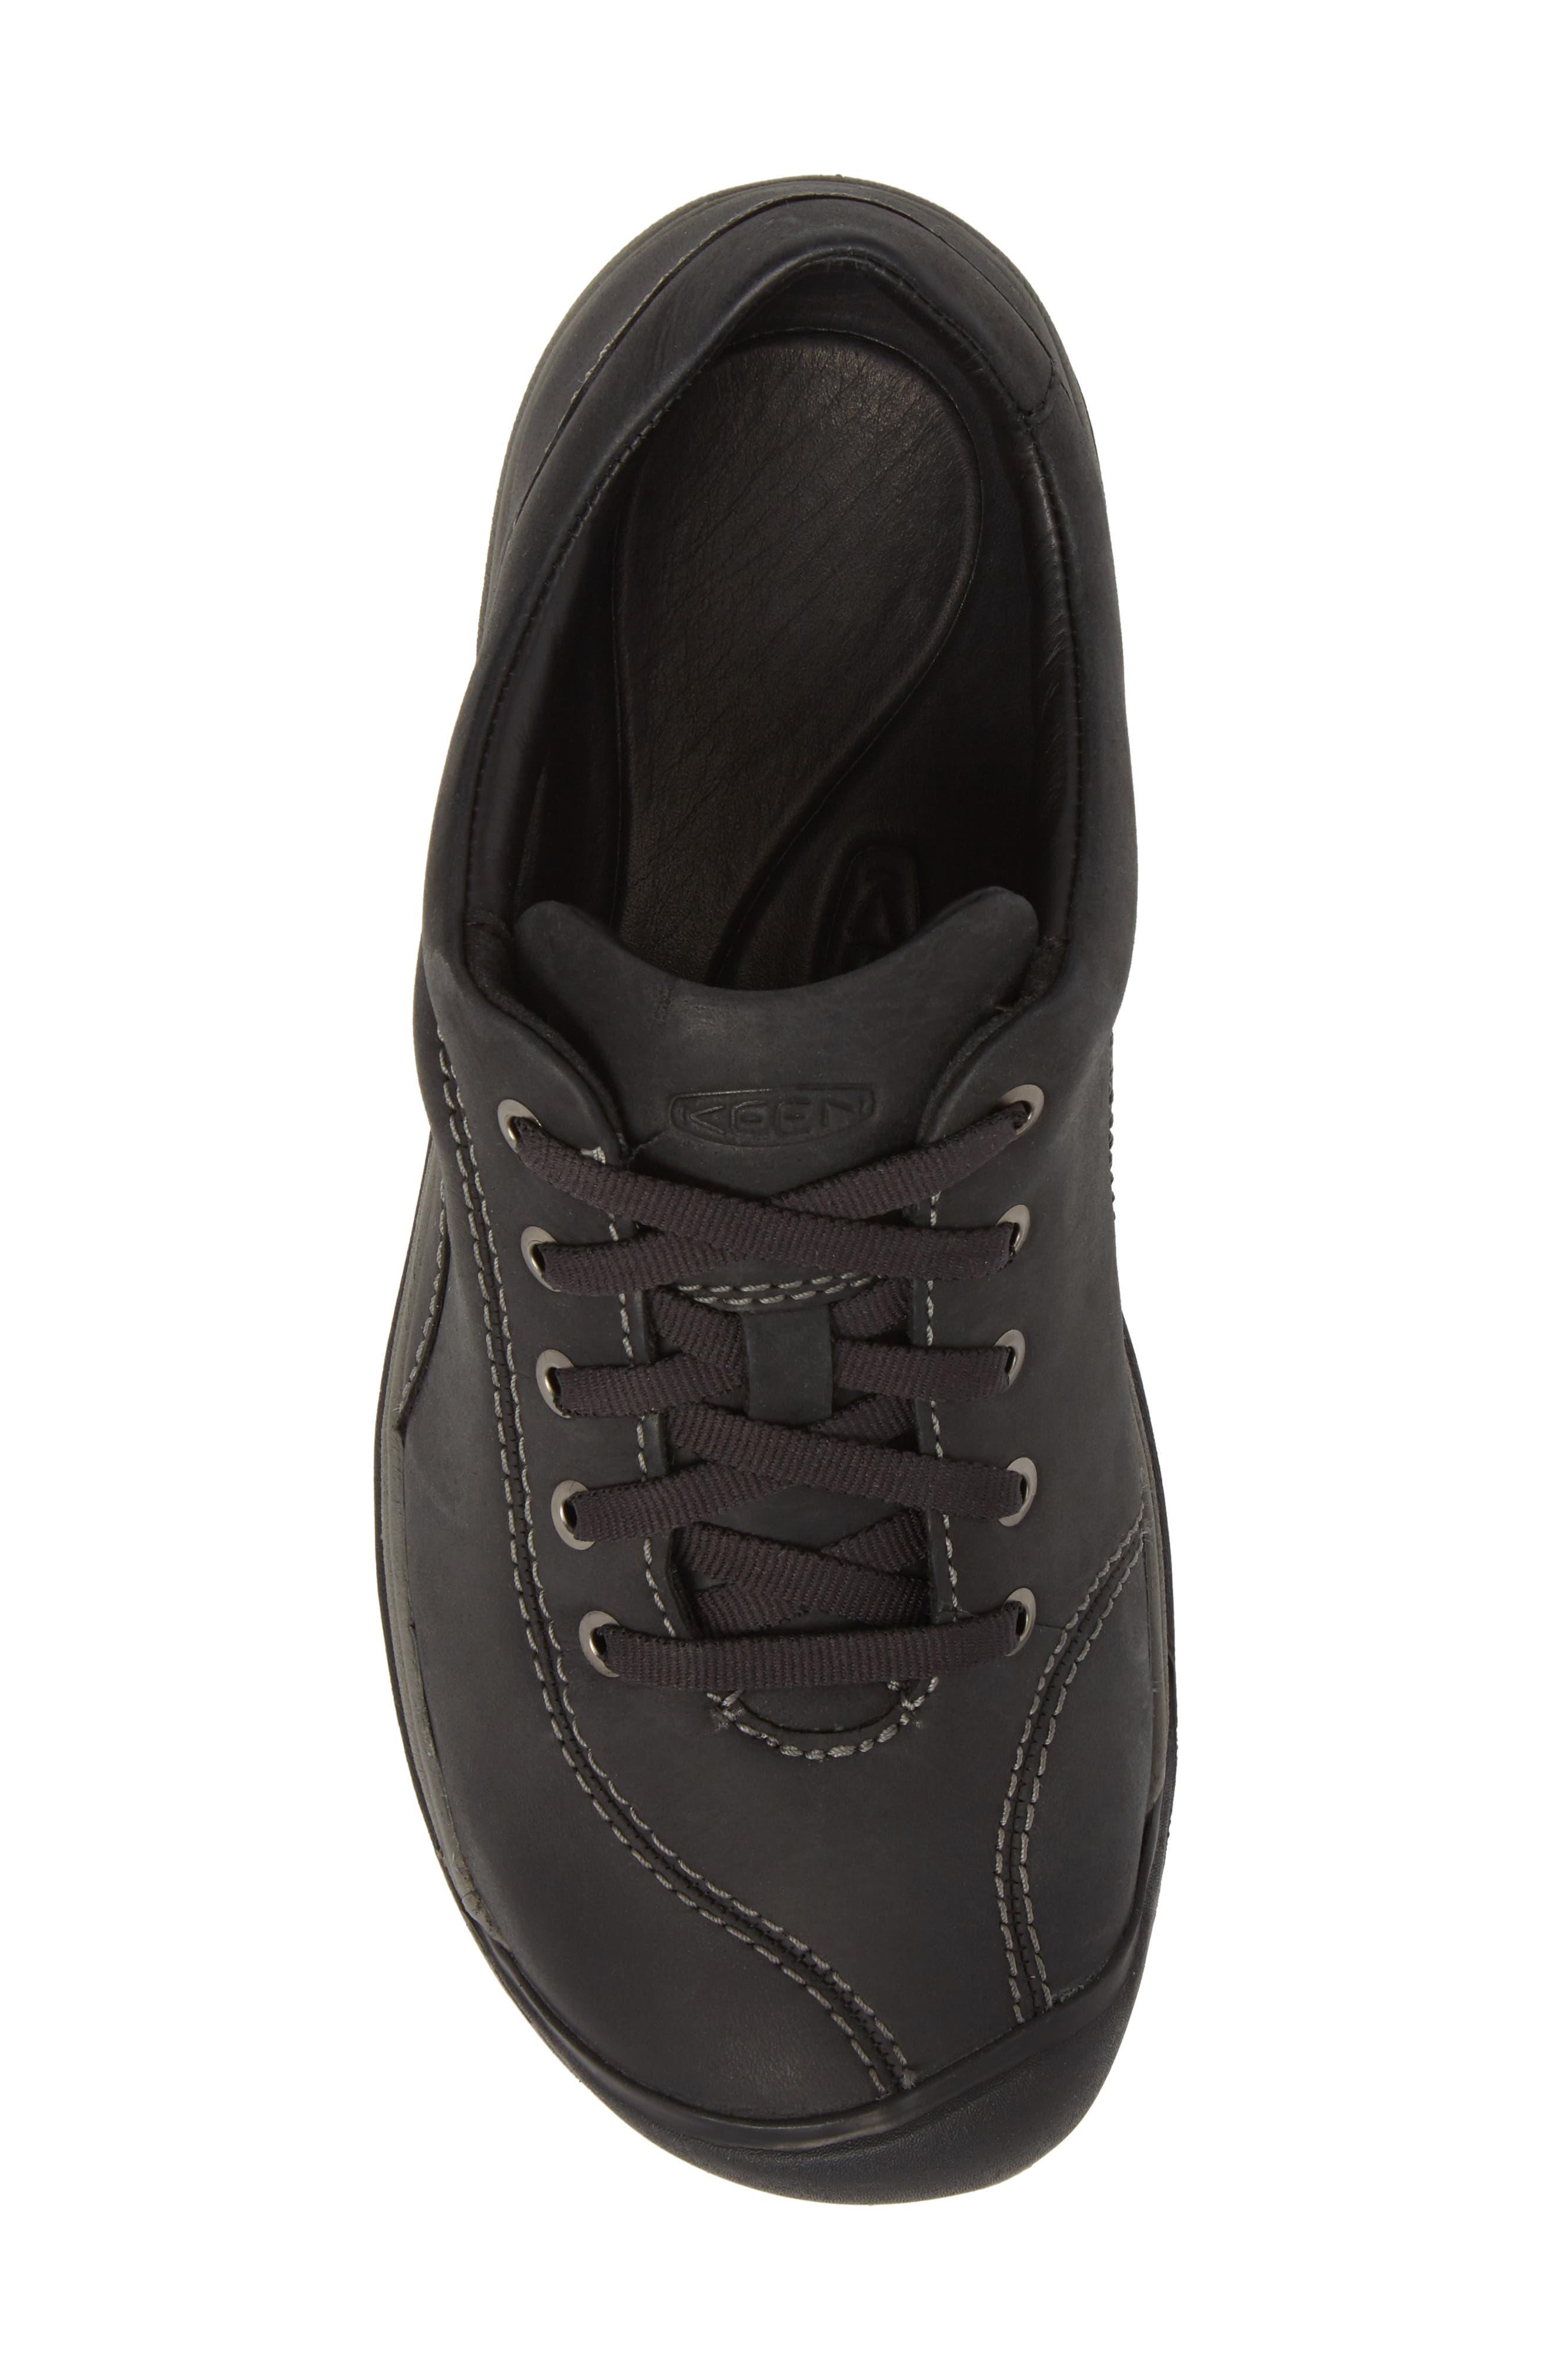 Presidio II Sneaker,                             Alternate thumbnail 5, color,                             BLACK/ STEEL GREY LEATHER